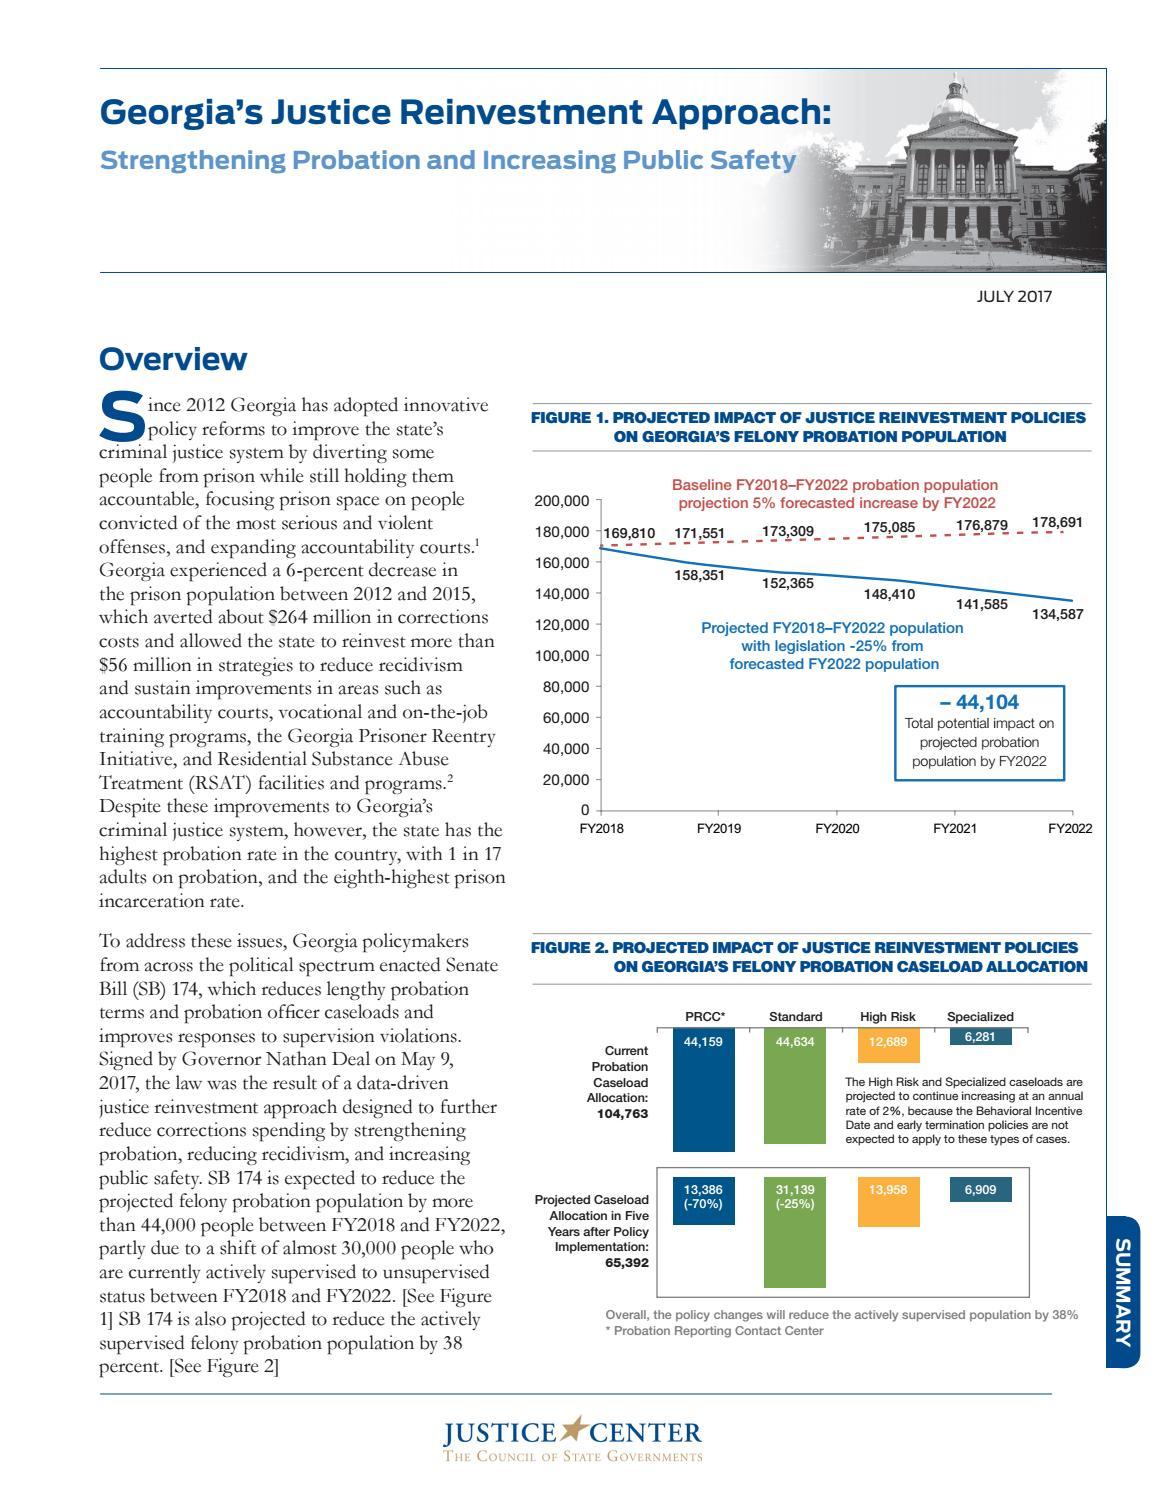 jr-in-ga_strengthening-probation-and-increasing-public